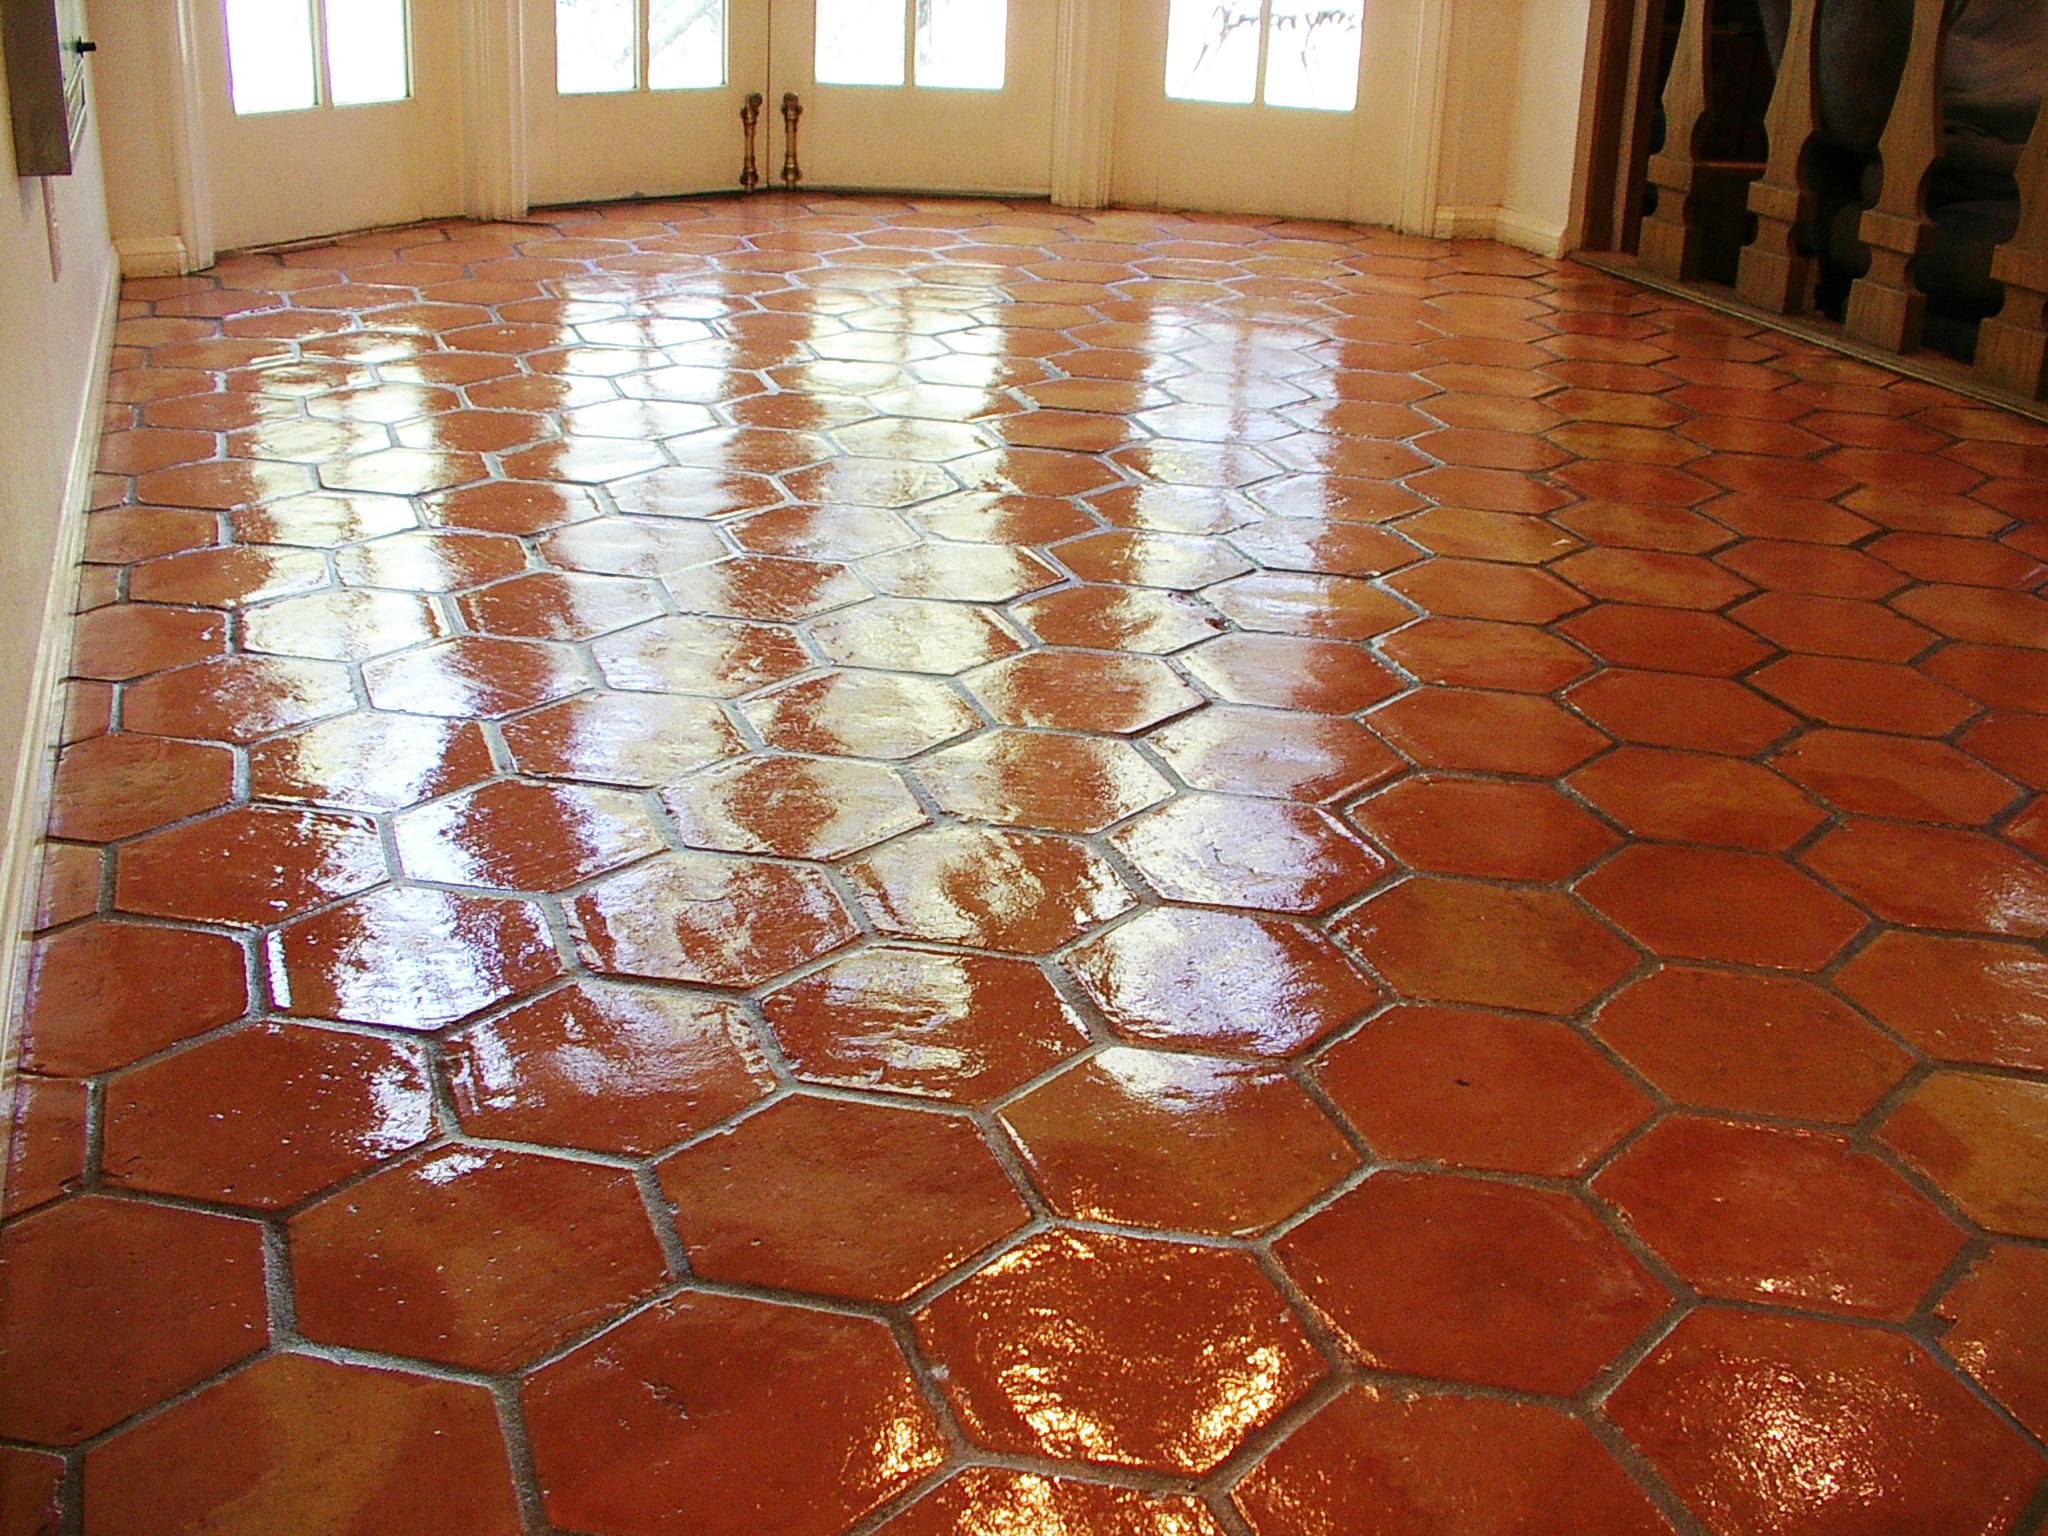 TestimonialsCalifornia Tile Sealers California Tile Sealers